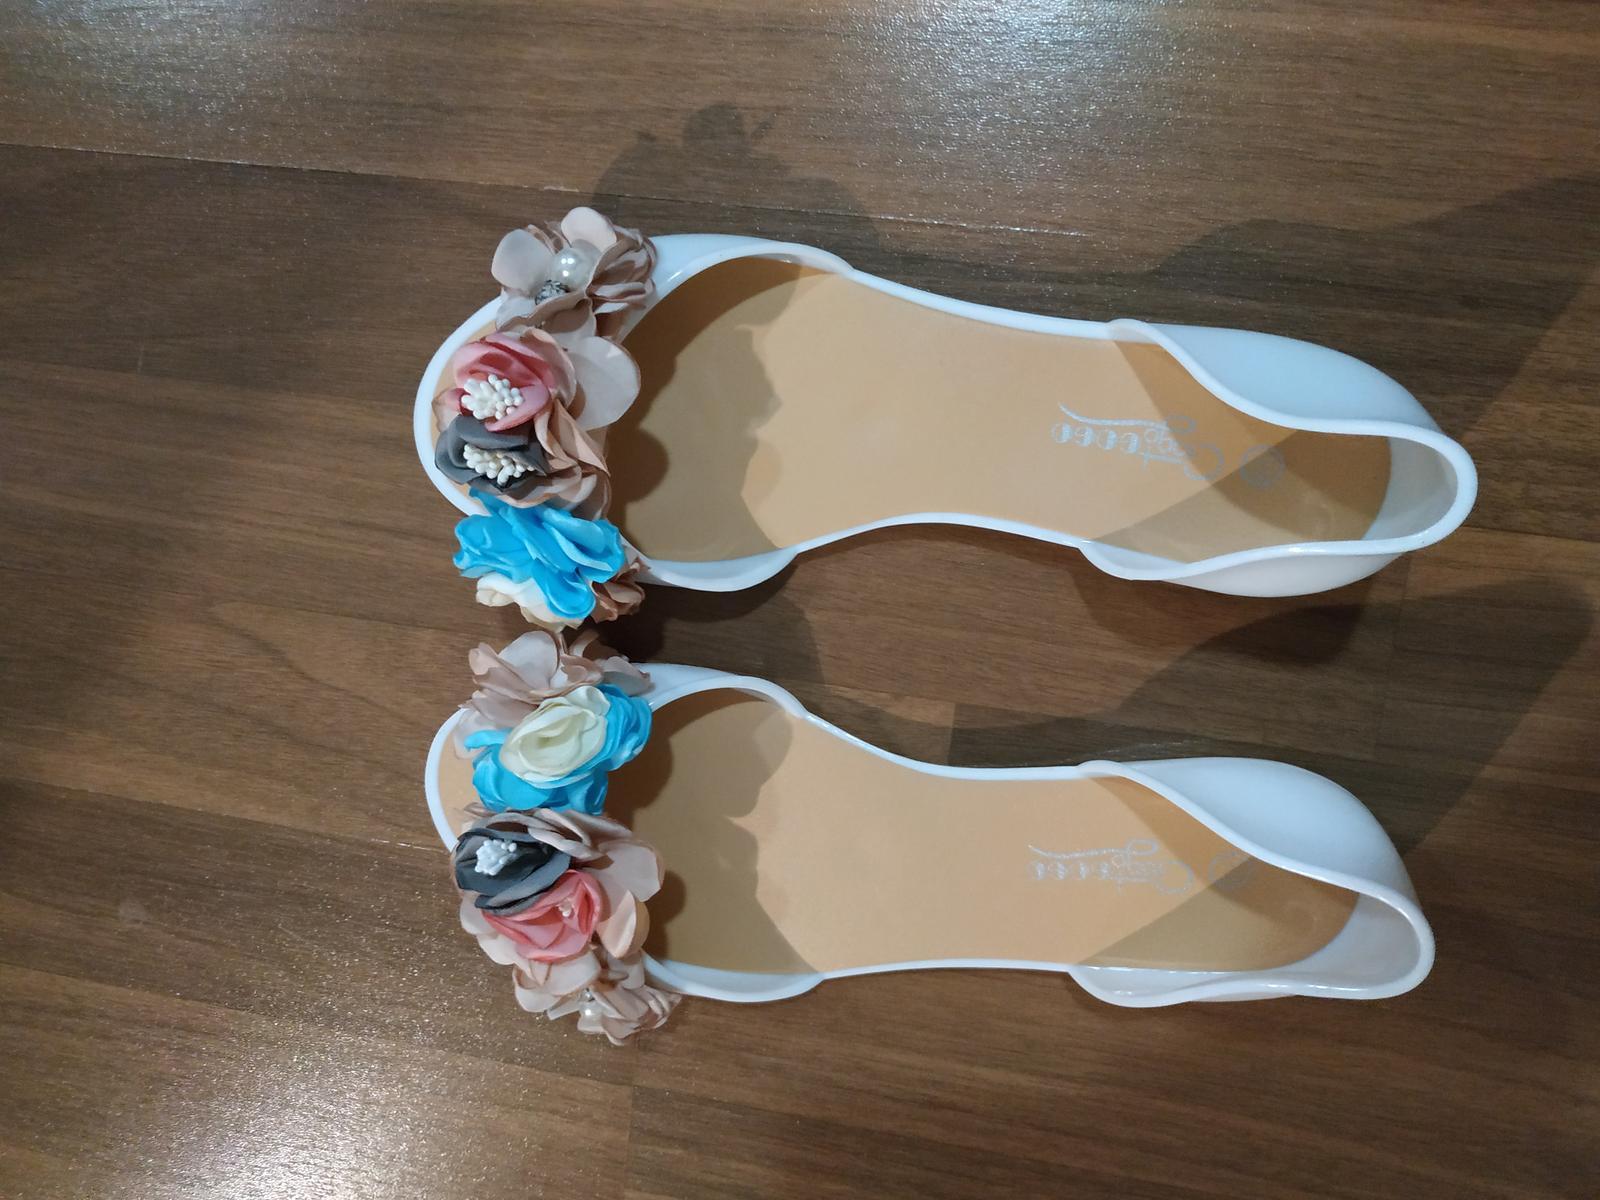 Boty s modrýma kytičkama - Obrázek č. 1